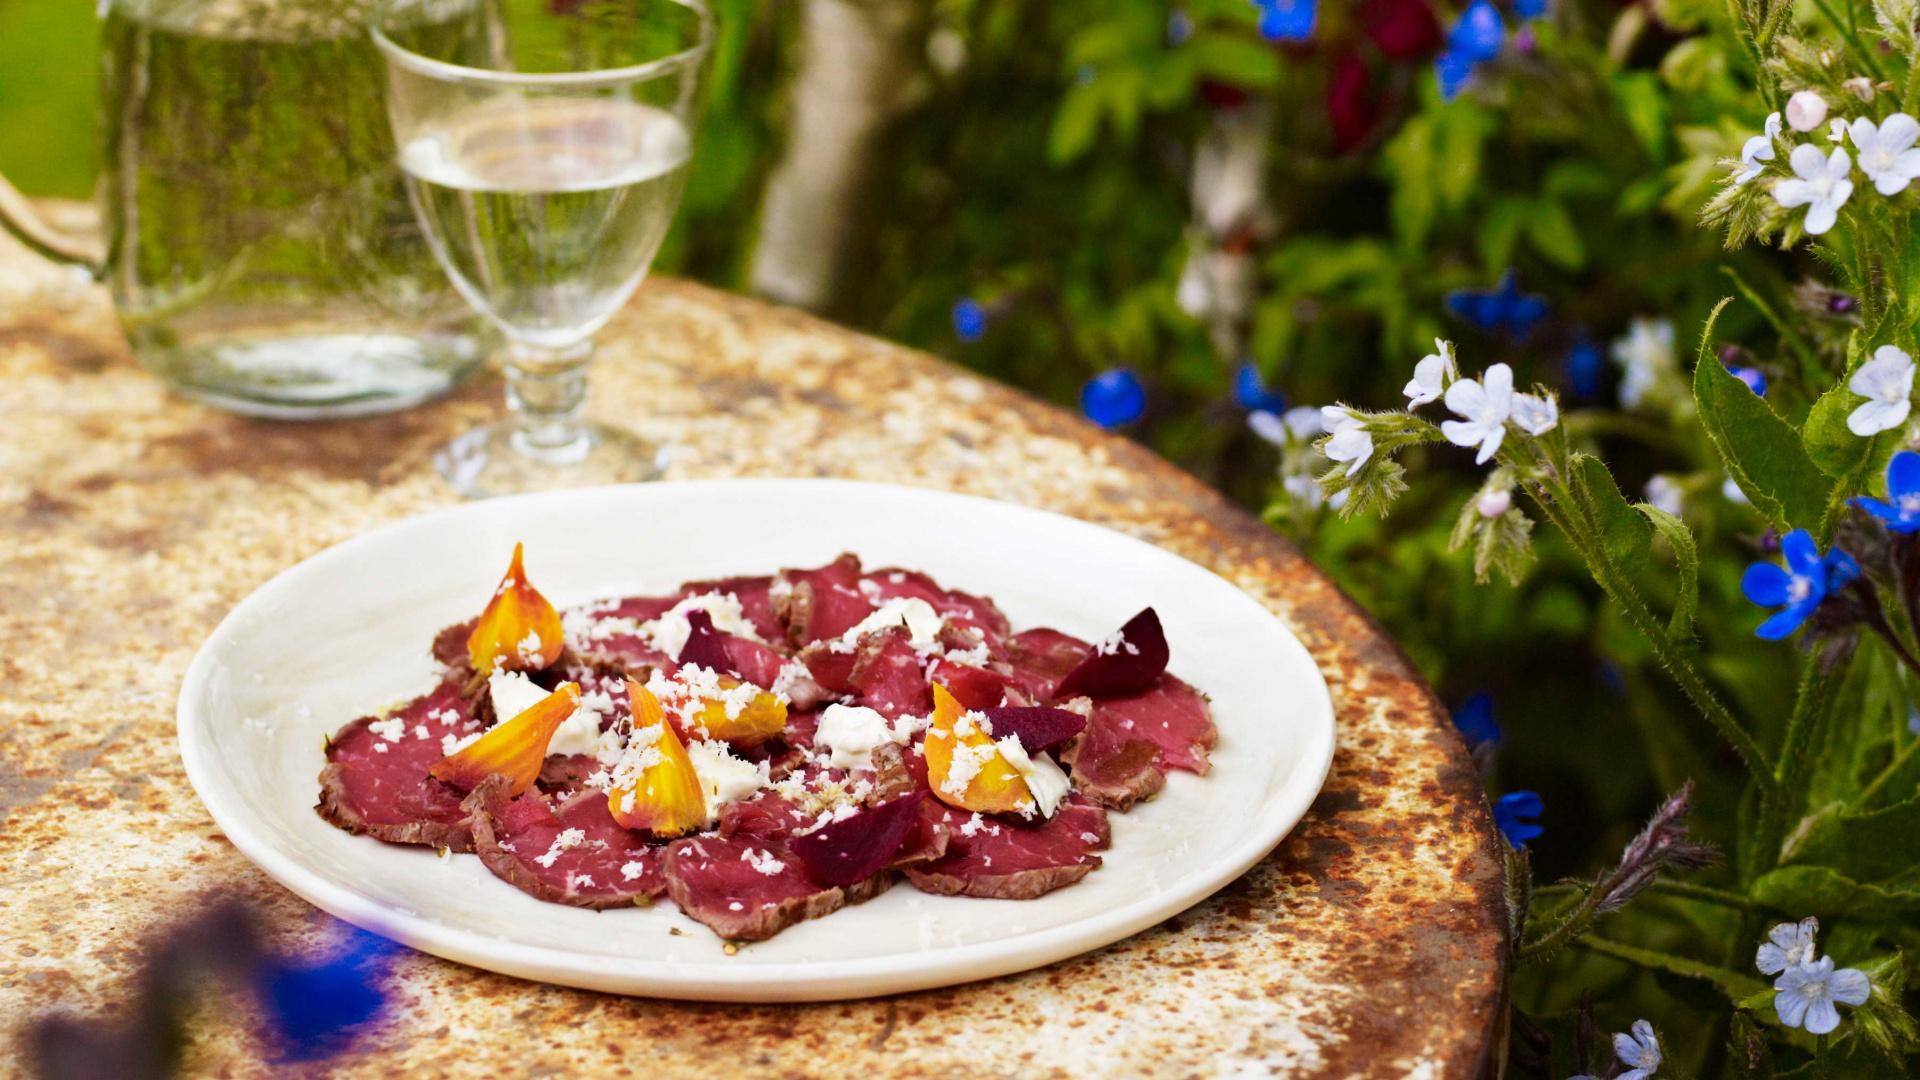 Petersham Nurseries recipe for beetroot and beef carpaccio